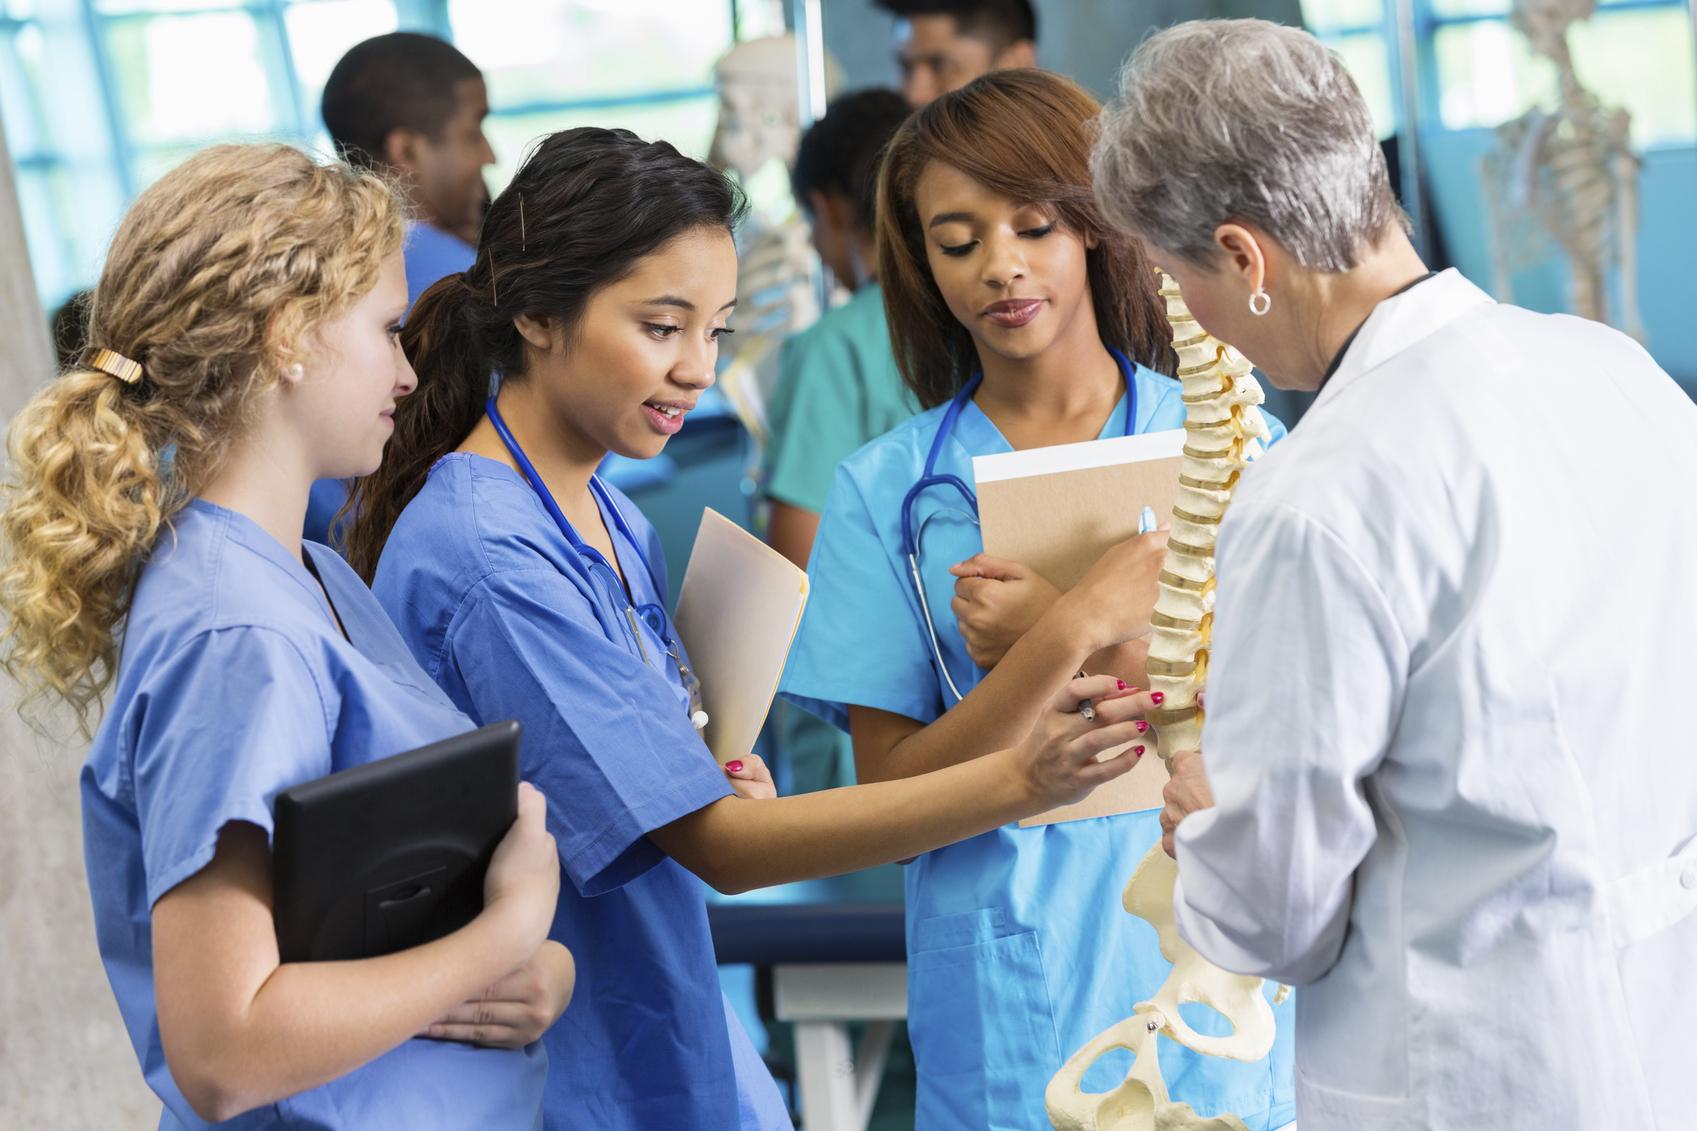 Medical School Professor Using Model To Teach Nursing Students The